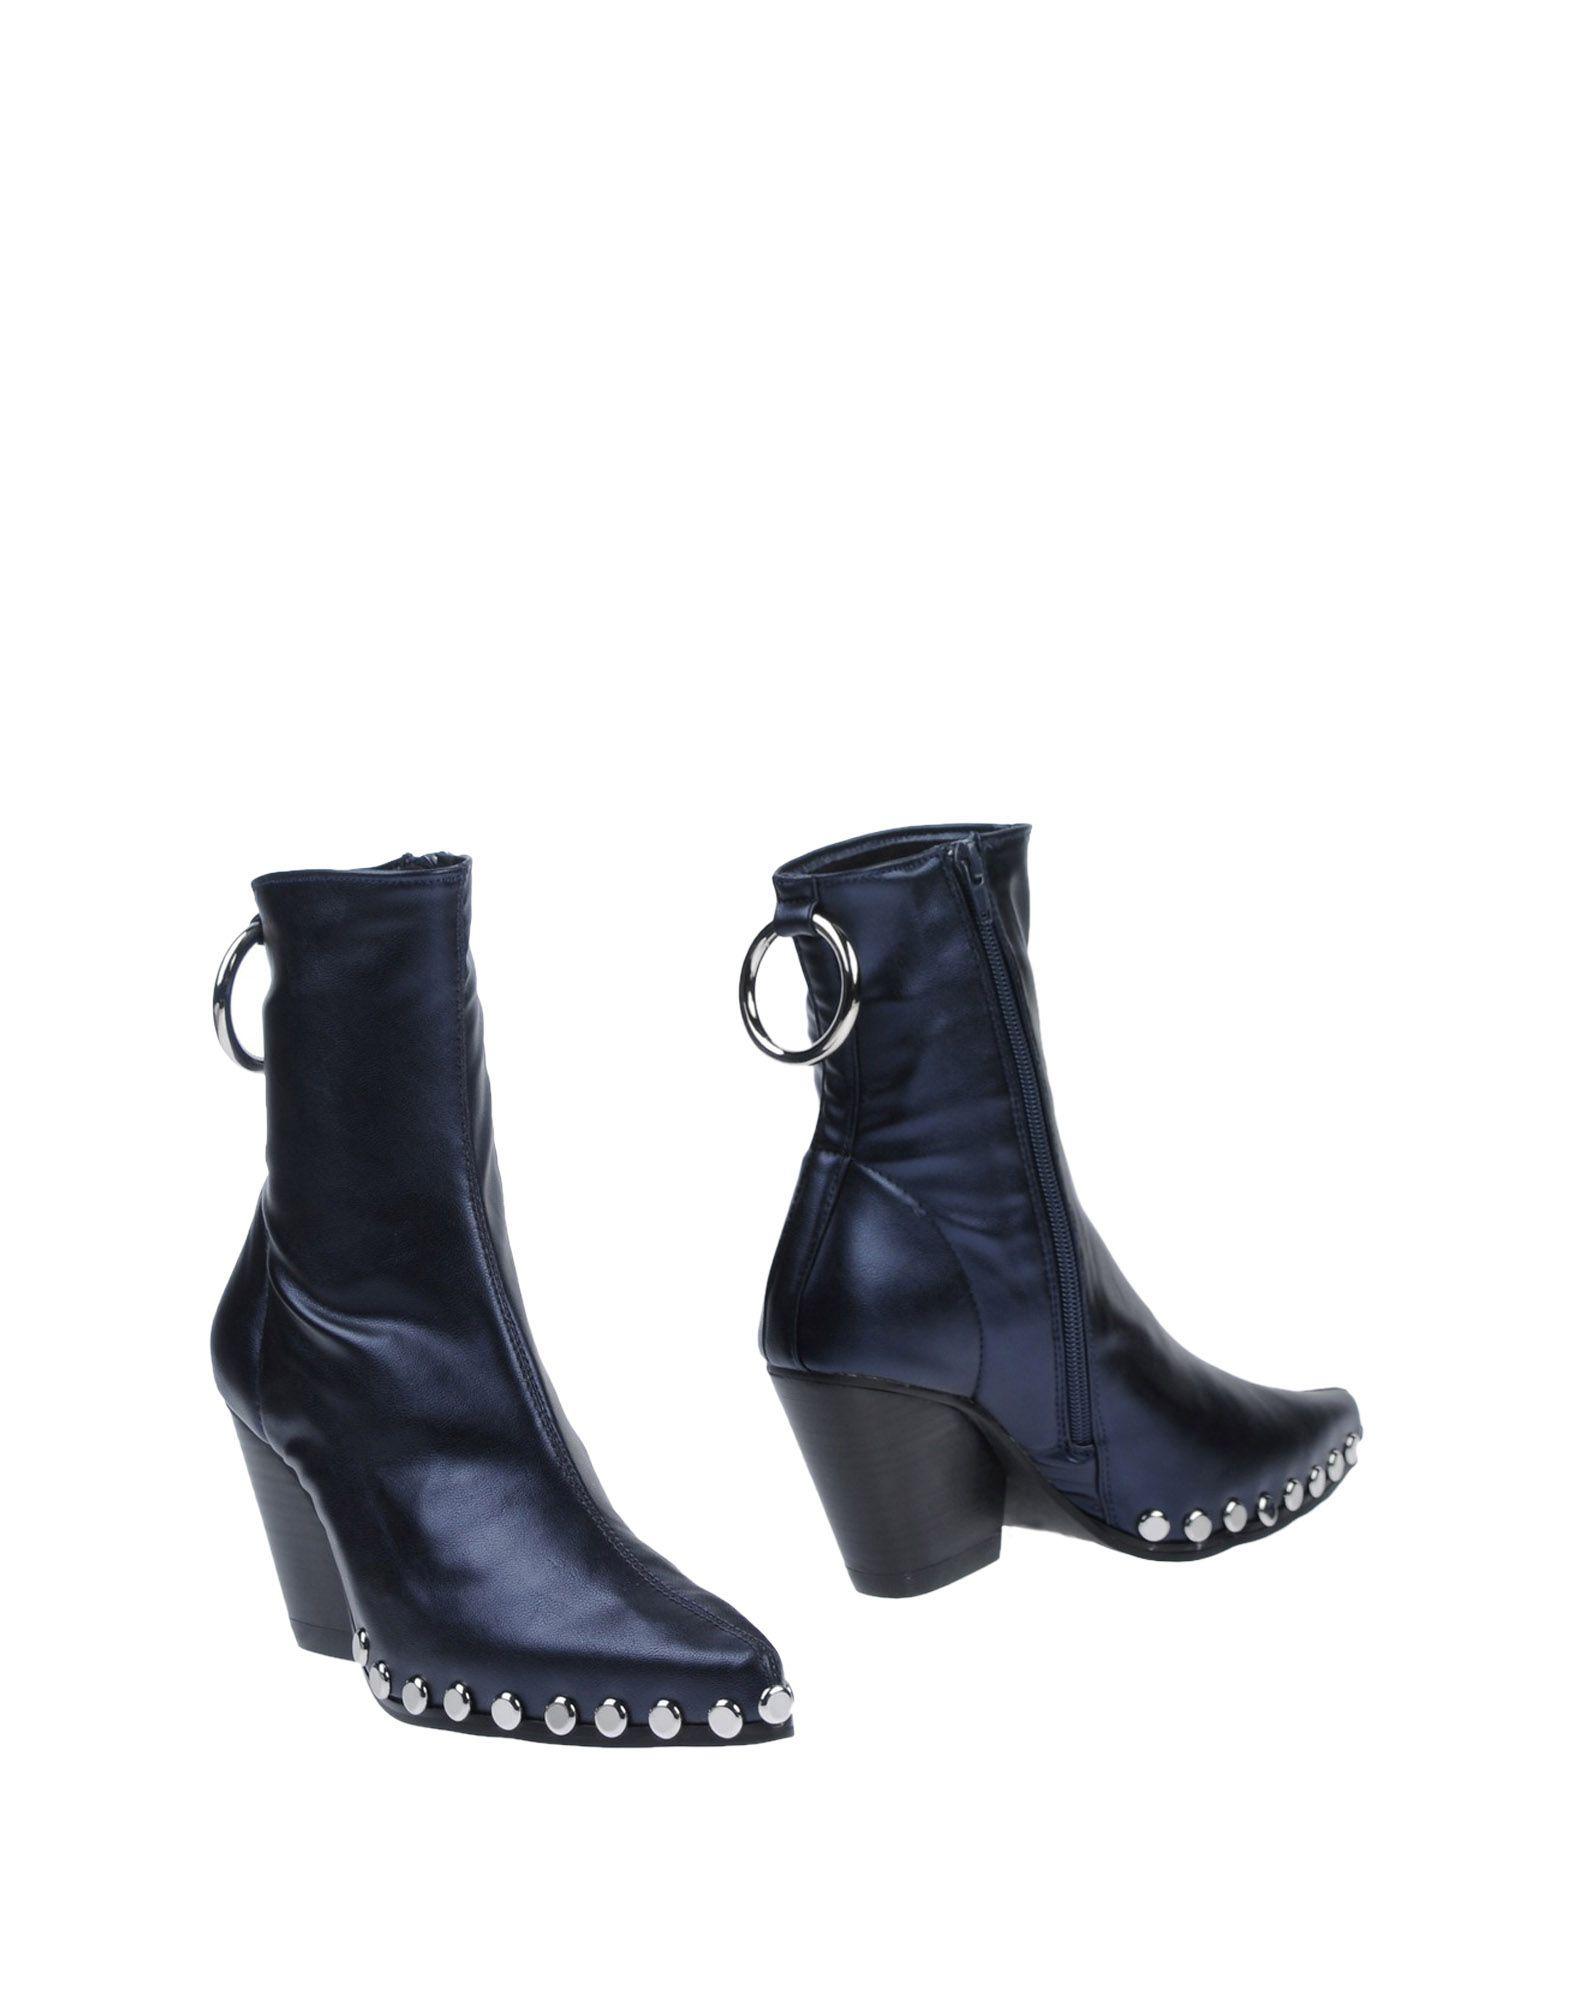 Gut um billige Damen Schuhe zu tragenJeffrey Campbell Stiefelette Damen billige  11508749XW 3d5d33